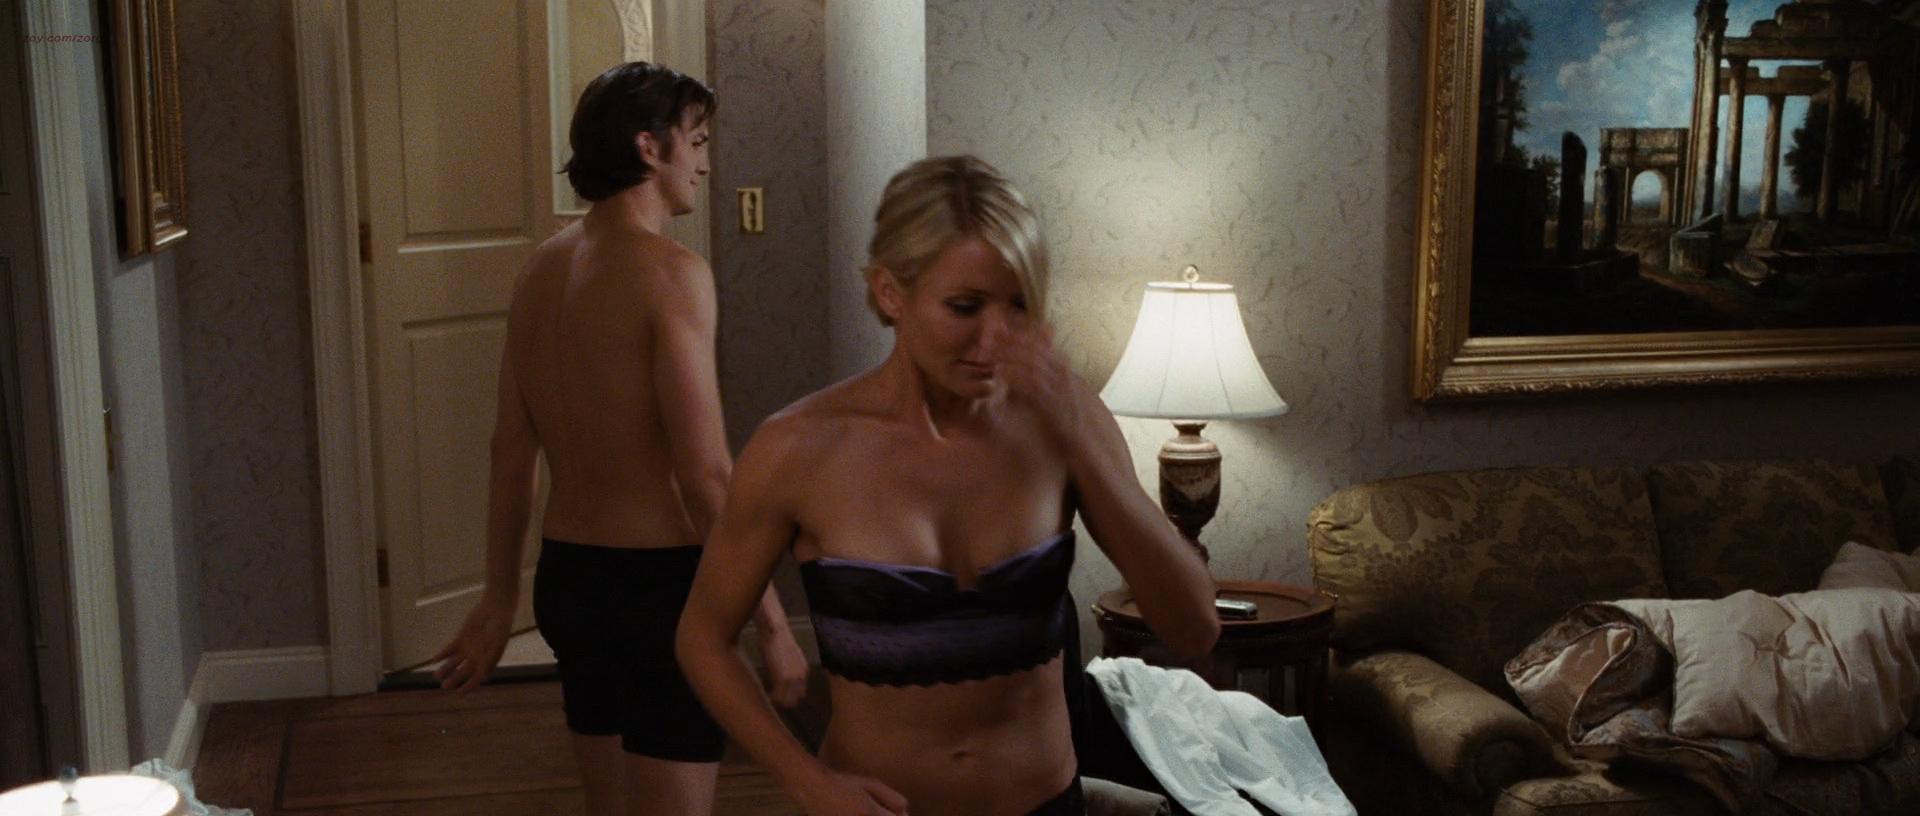 Cameron Diaz hot Krysten Ritter lingerie and Lake Bell hot in undies - What Happens In Vegas (2008) hd1080p (16)